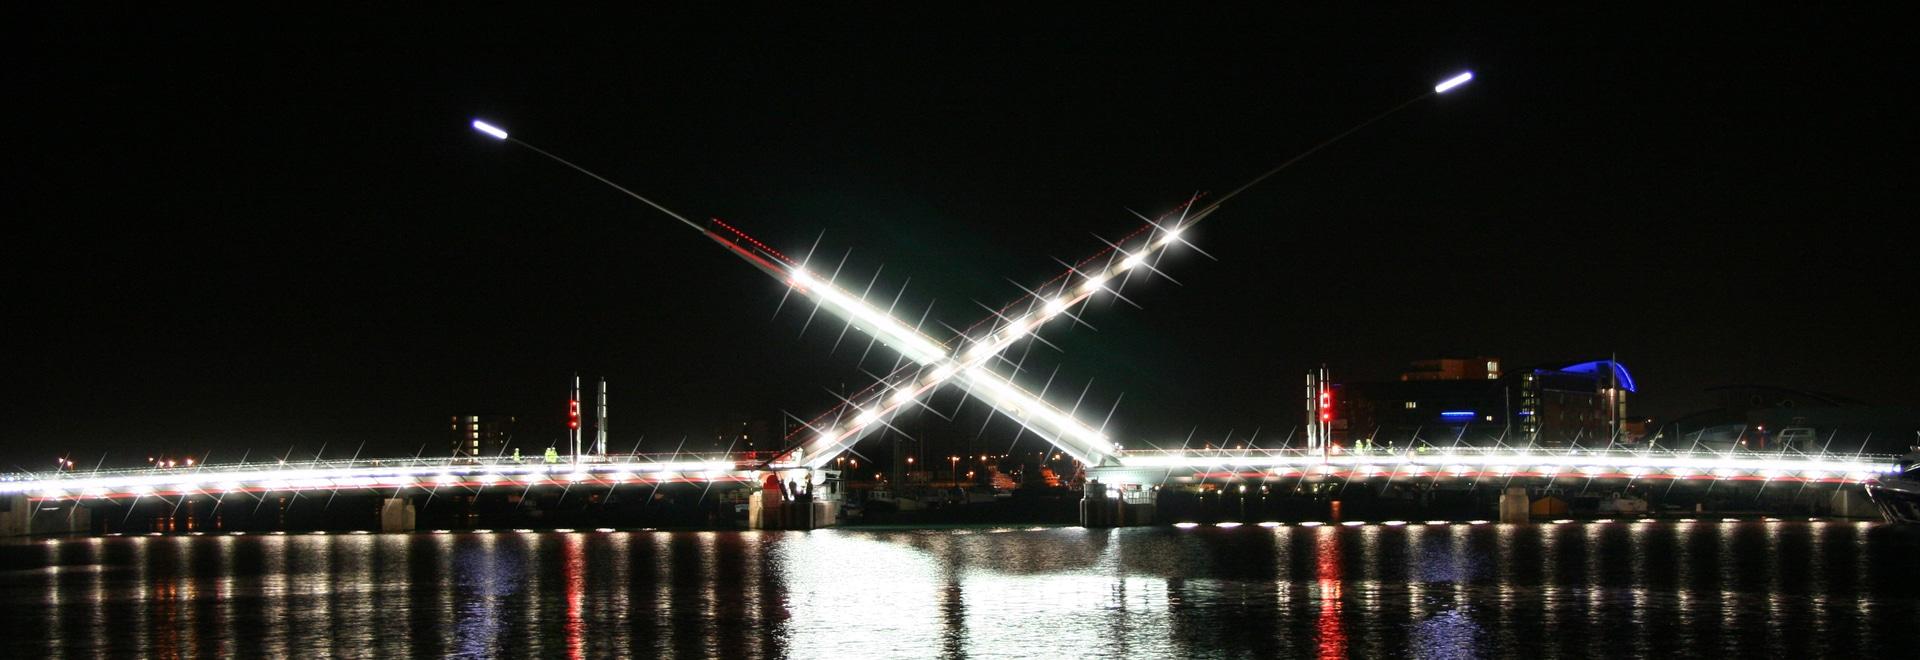 Macalloy S1030 Post Tensioning Bar - Twin Sails Brisge, Poole, UK